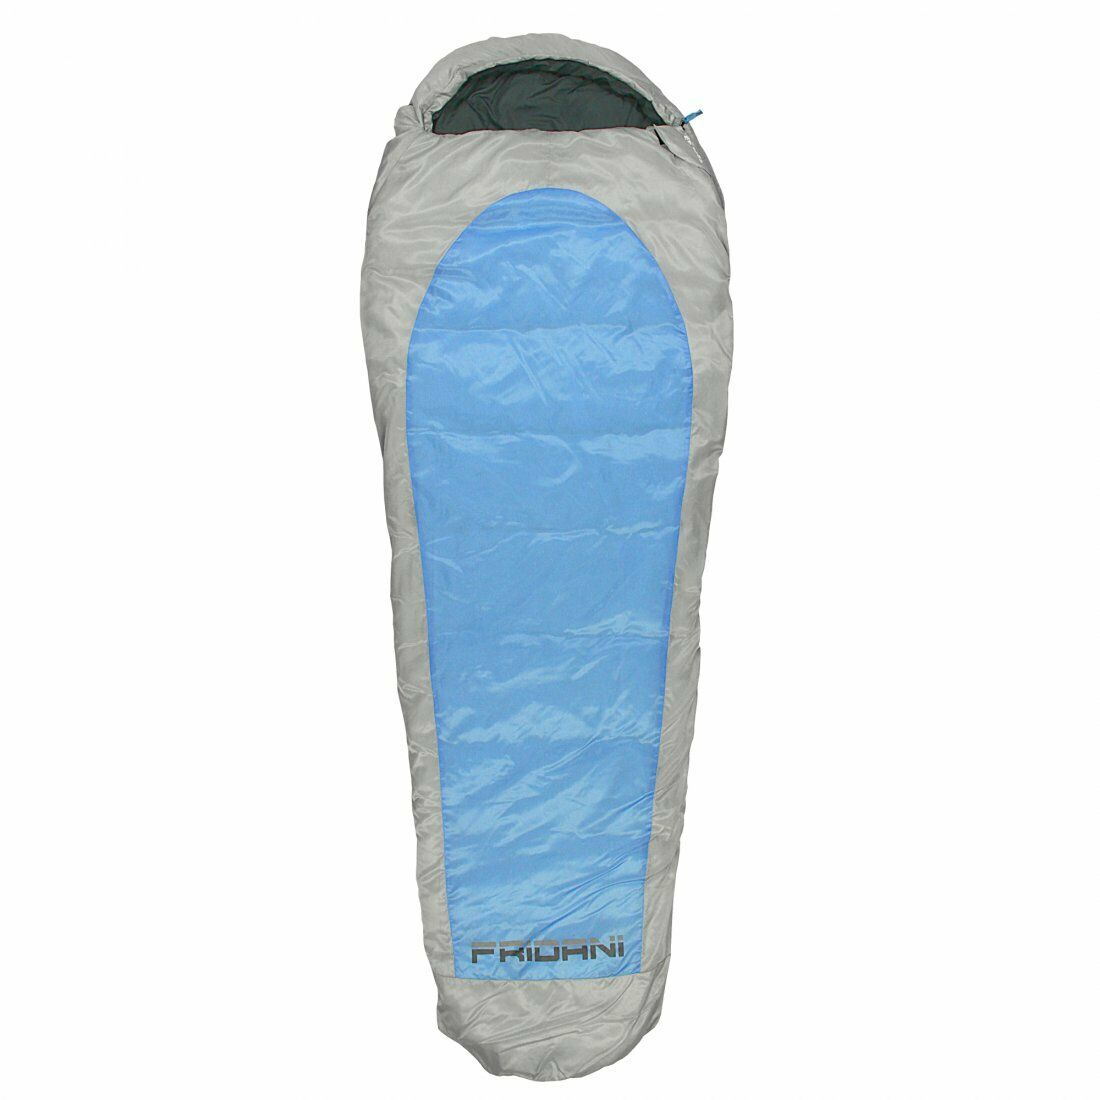 Sleeping Bag EB 235x85 XL Mummy Sleeping Bag bluee -20°C water-repellent washable